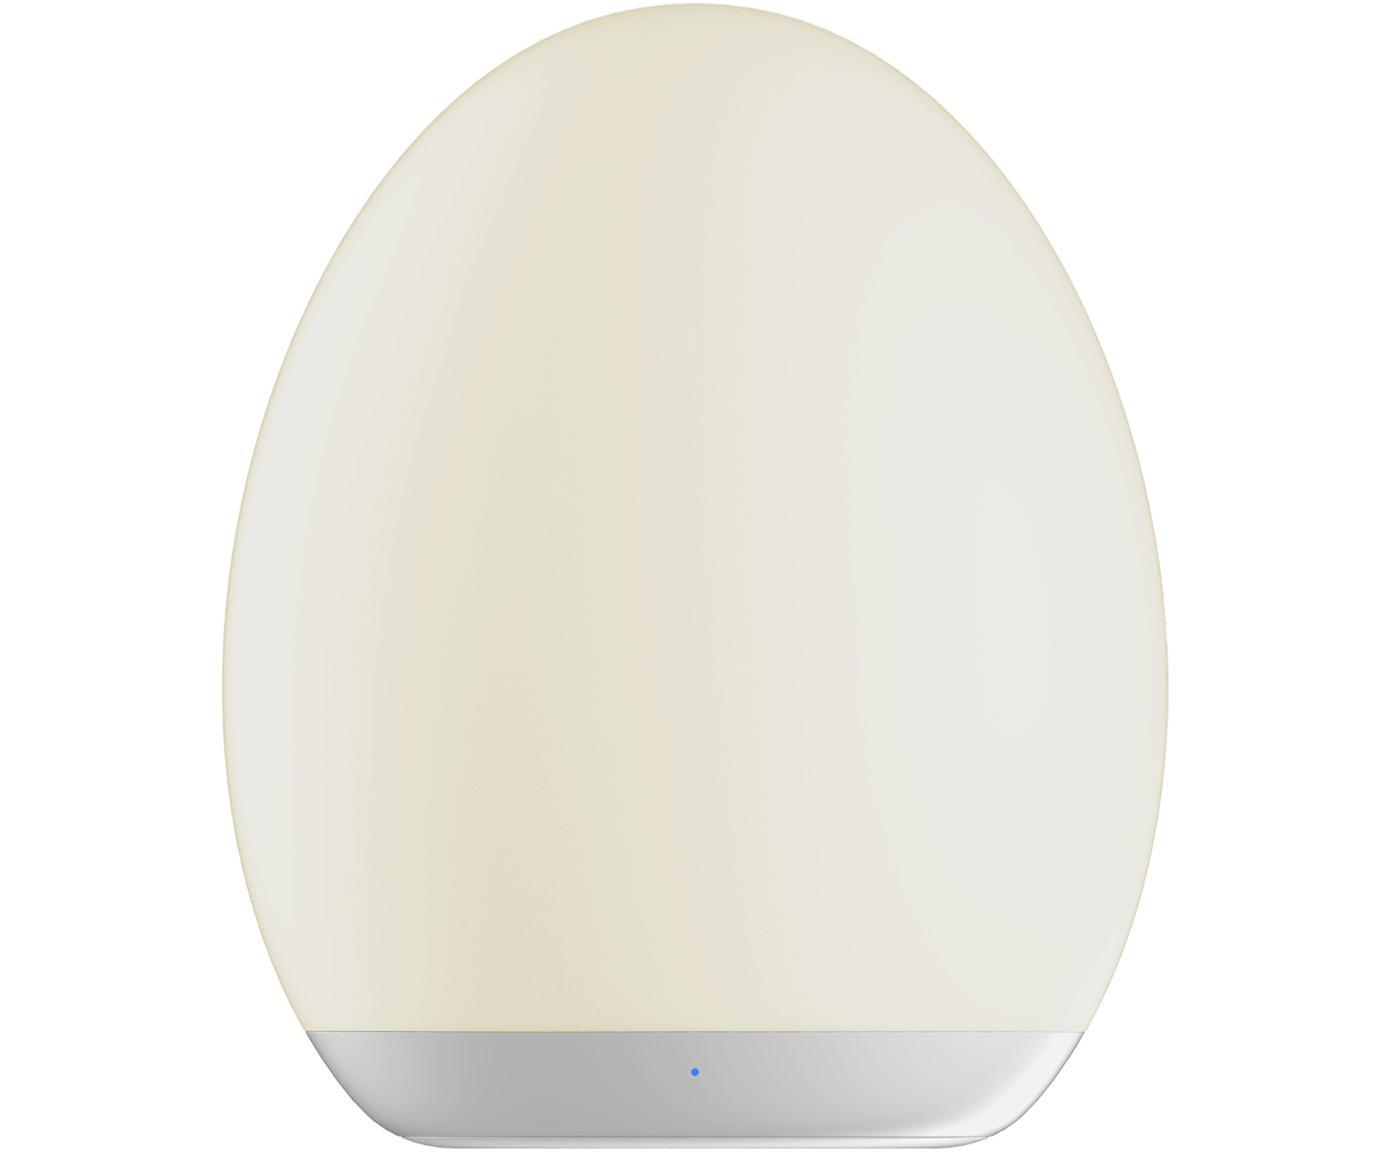 Lampada a LED da esterno Nadia, Plastica (ABS), Bianco, Ø 9 x Alt. 11 cm